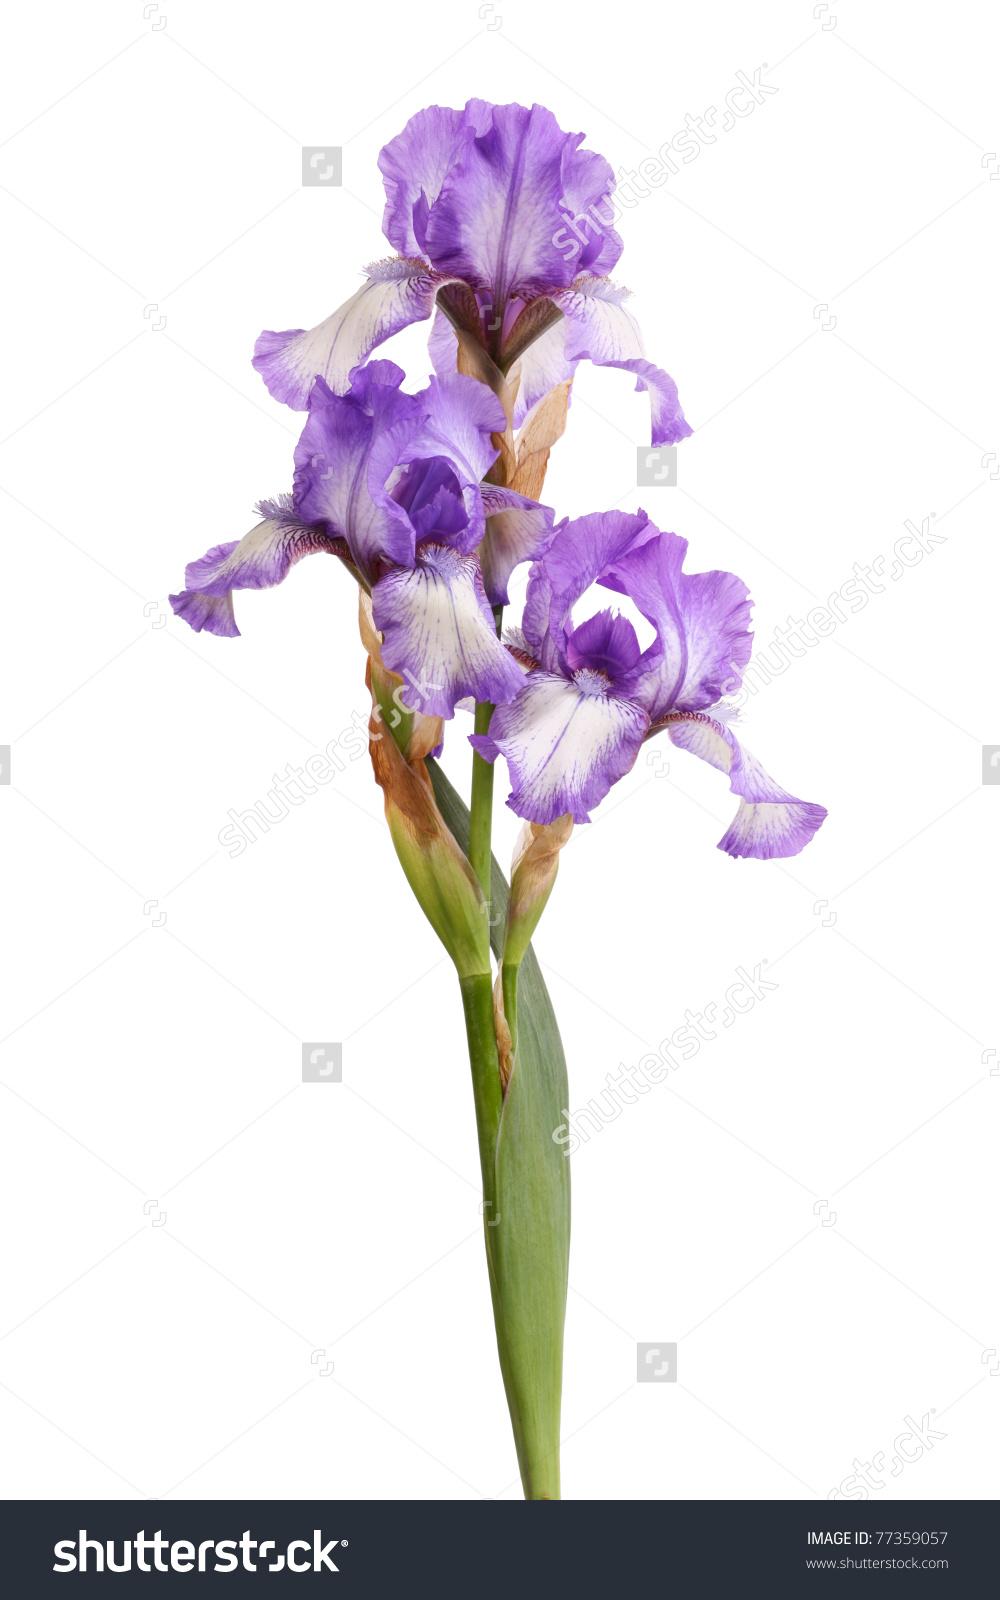 Stem Three Purple White Plicata Flowers Stock Photo 77359057.